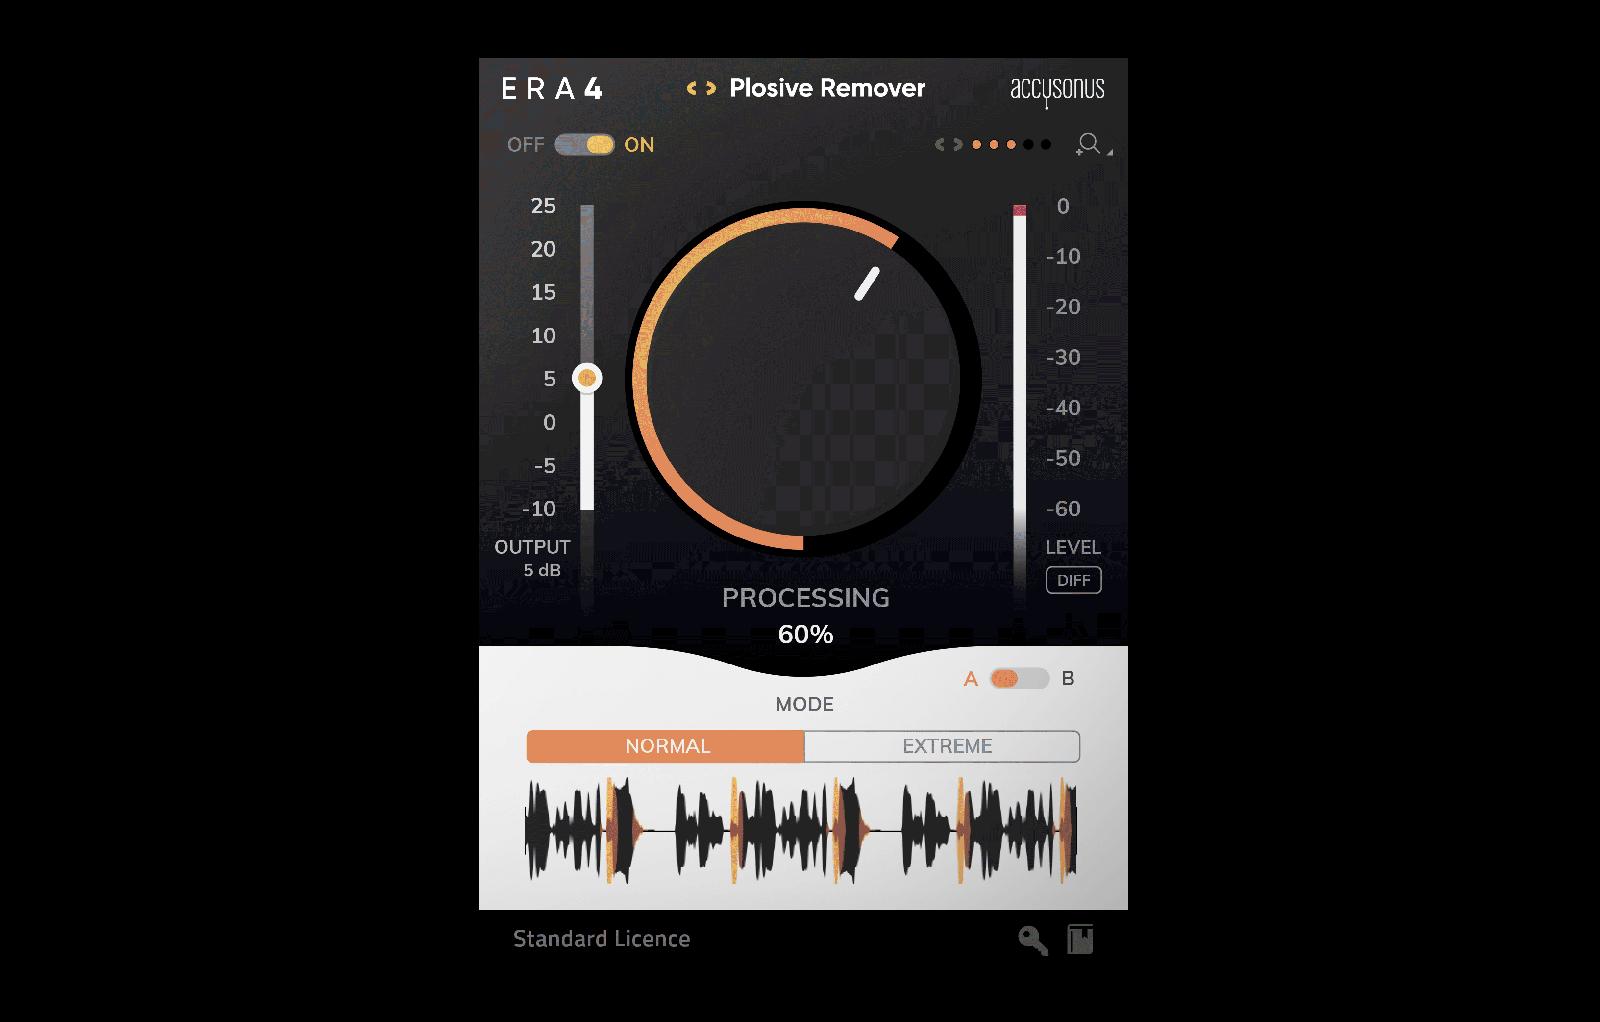 ERA - Plosive Remover